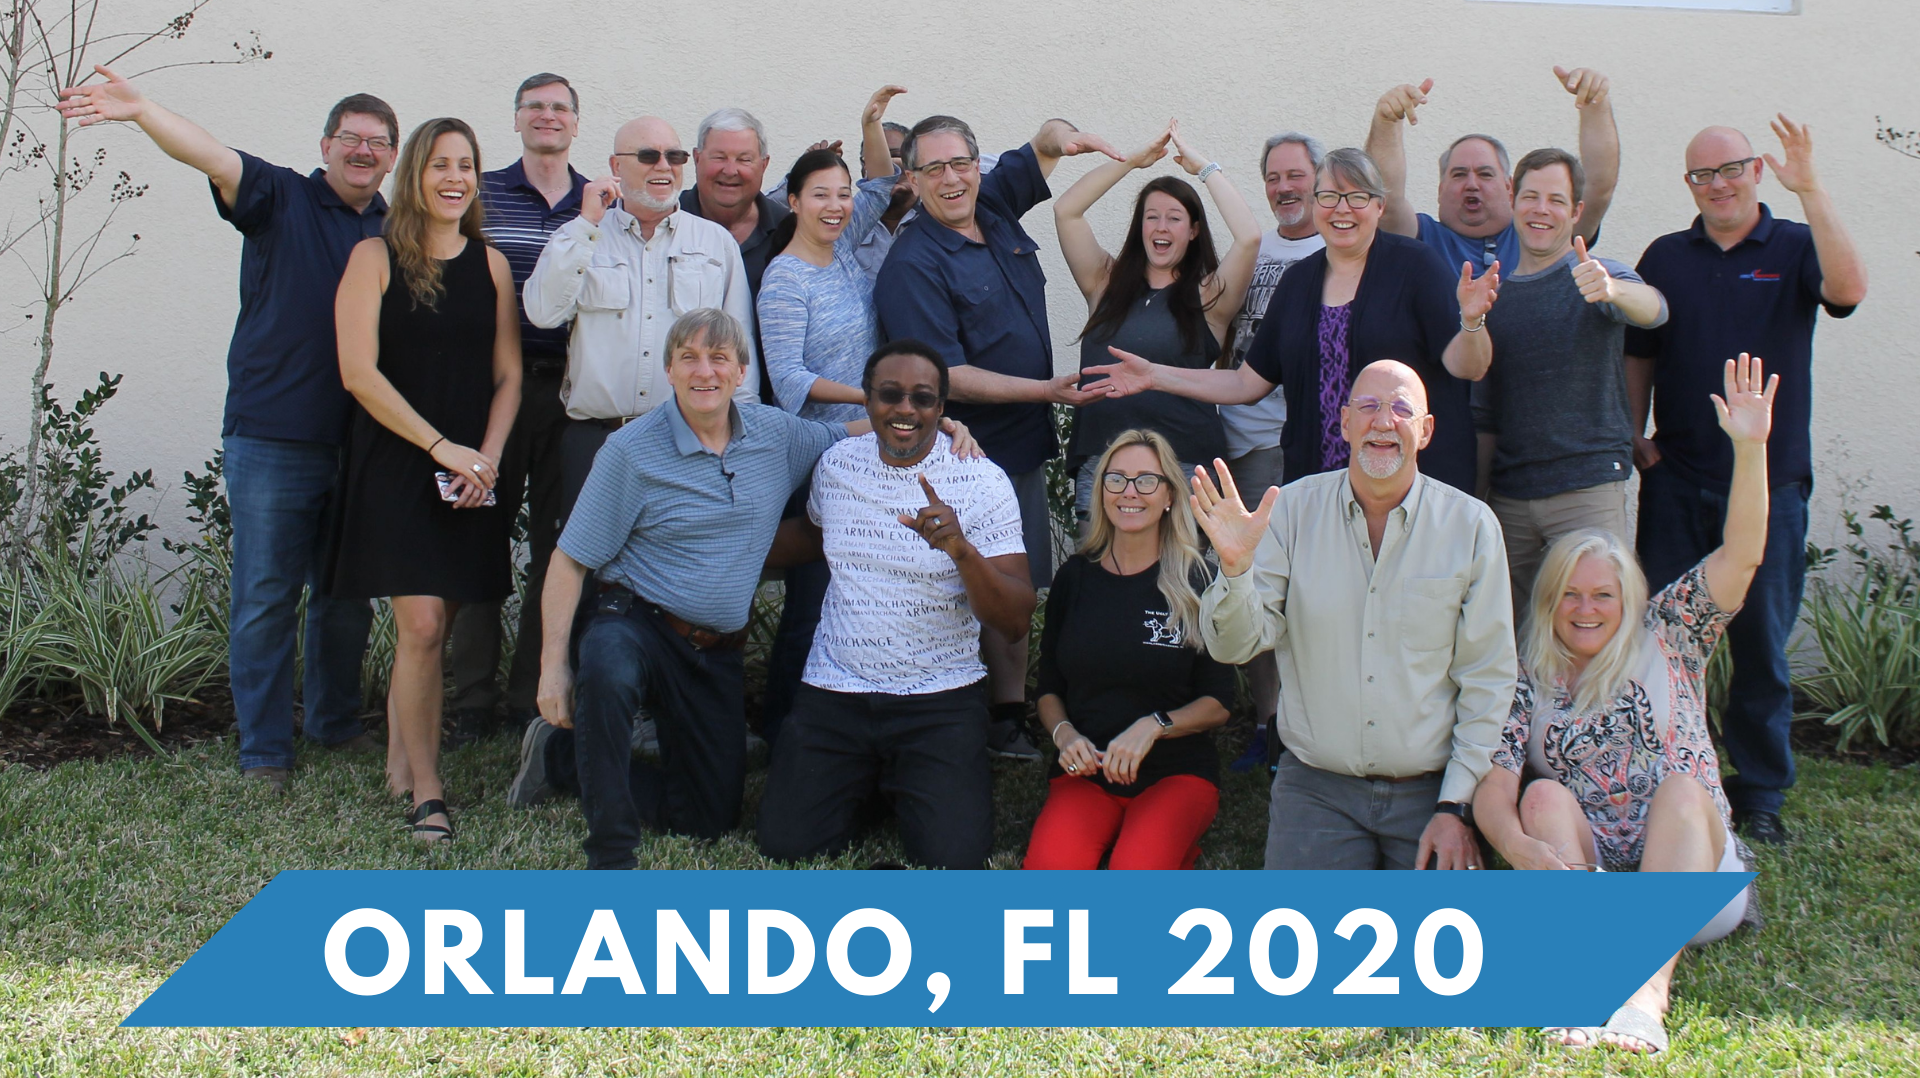 Chief Architect Training by Chief Experts Academy 2020 Orlando, Florida